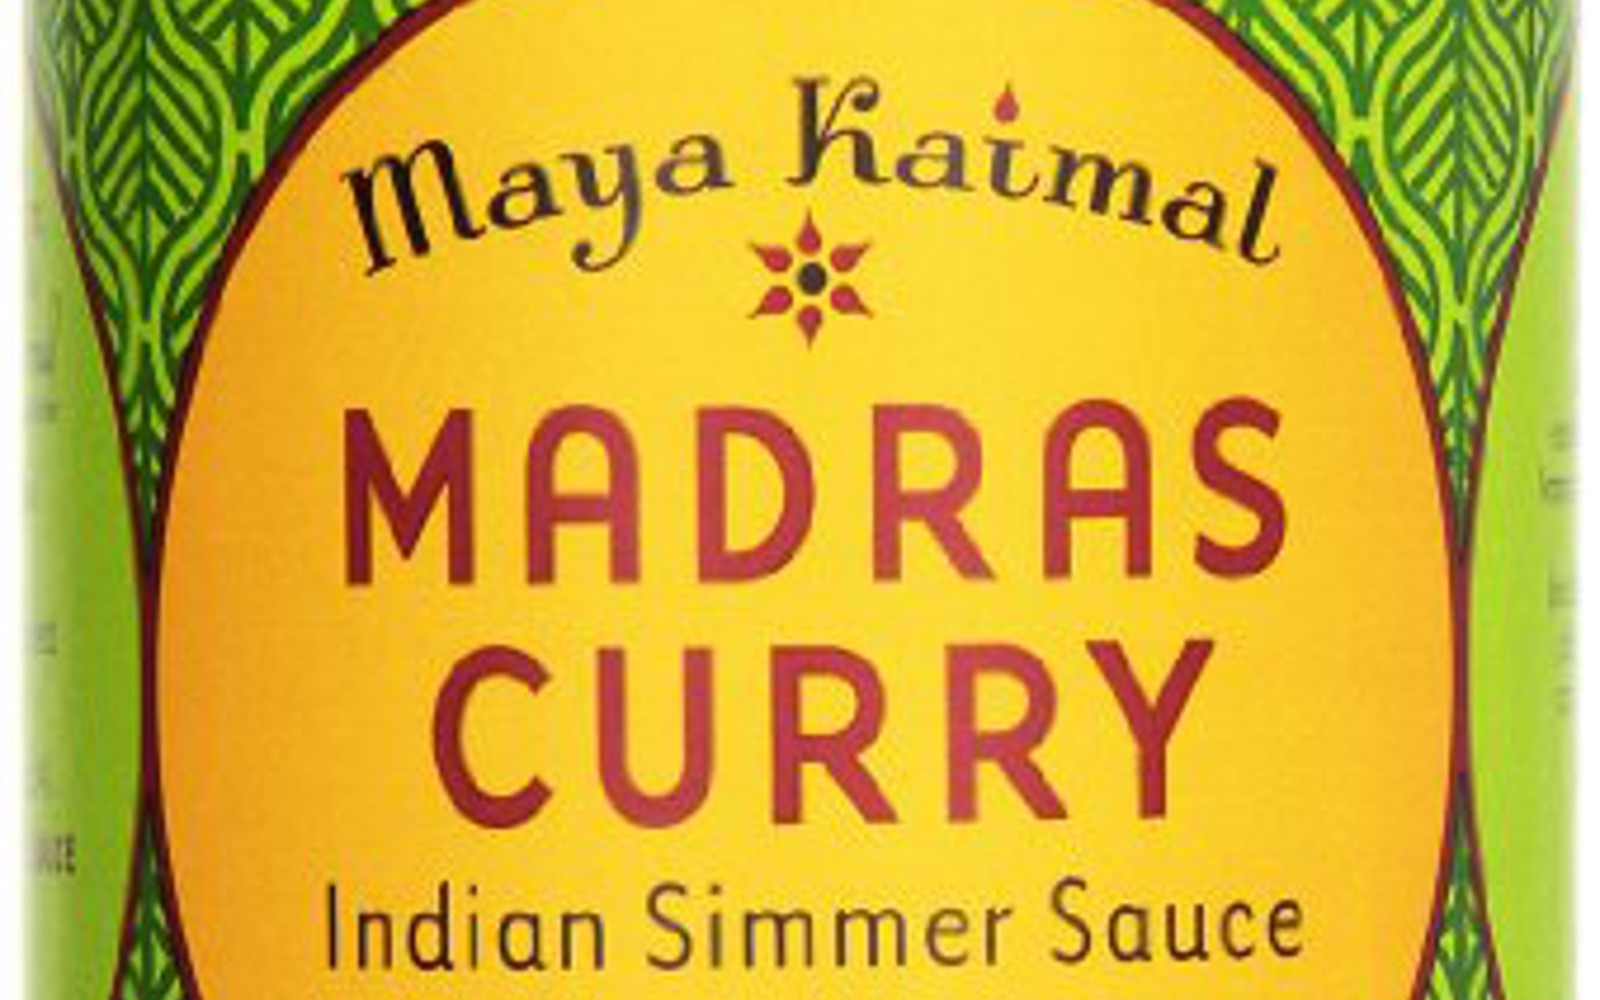 Maya Kaimal Madras Curry